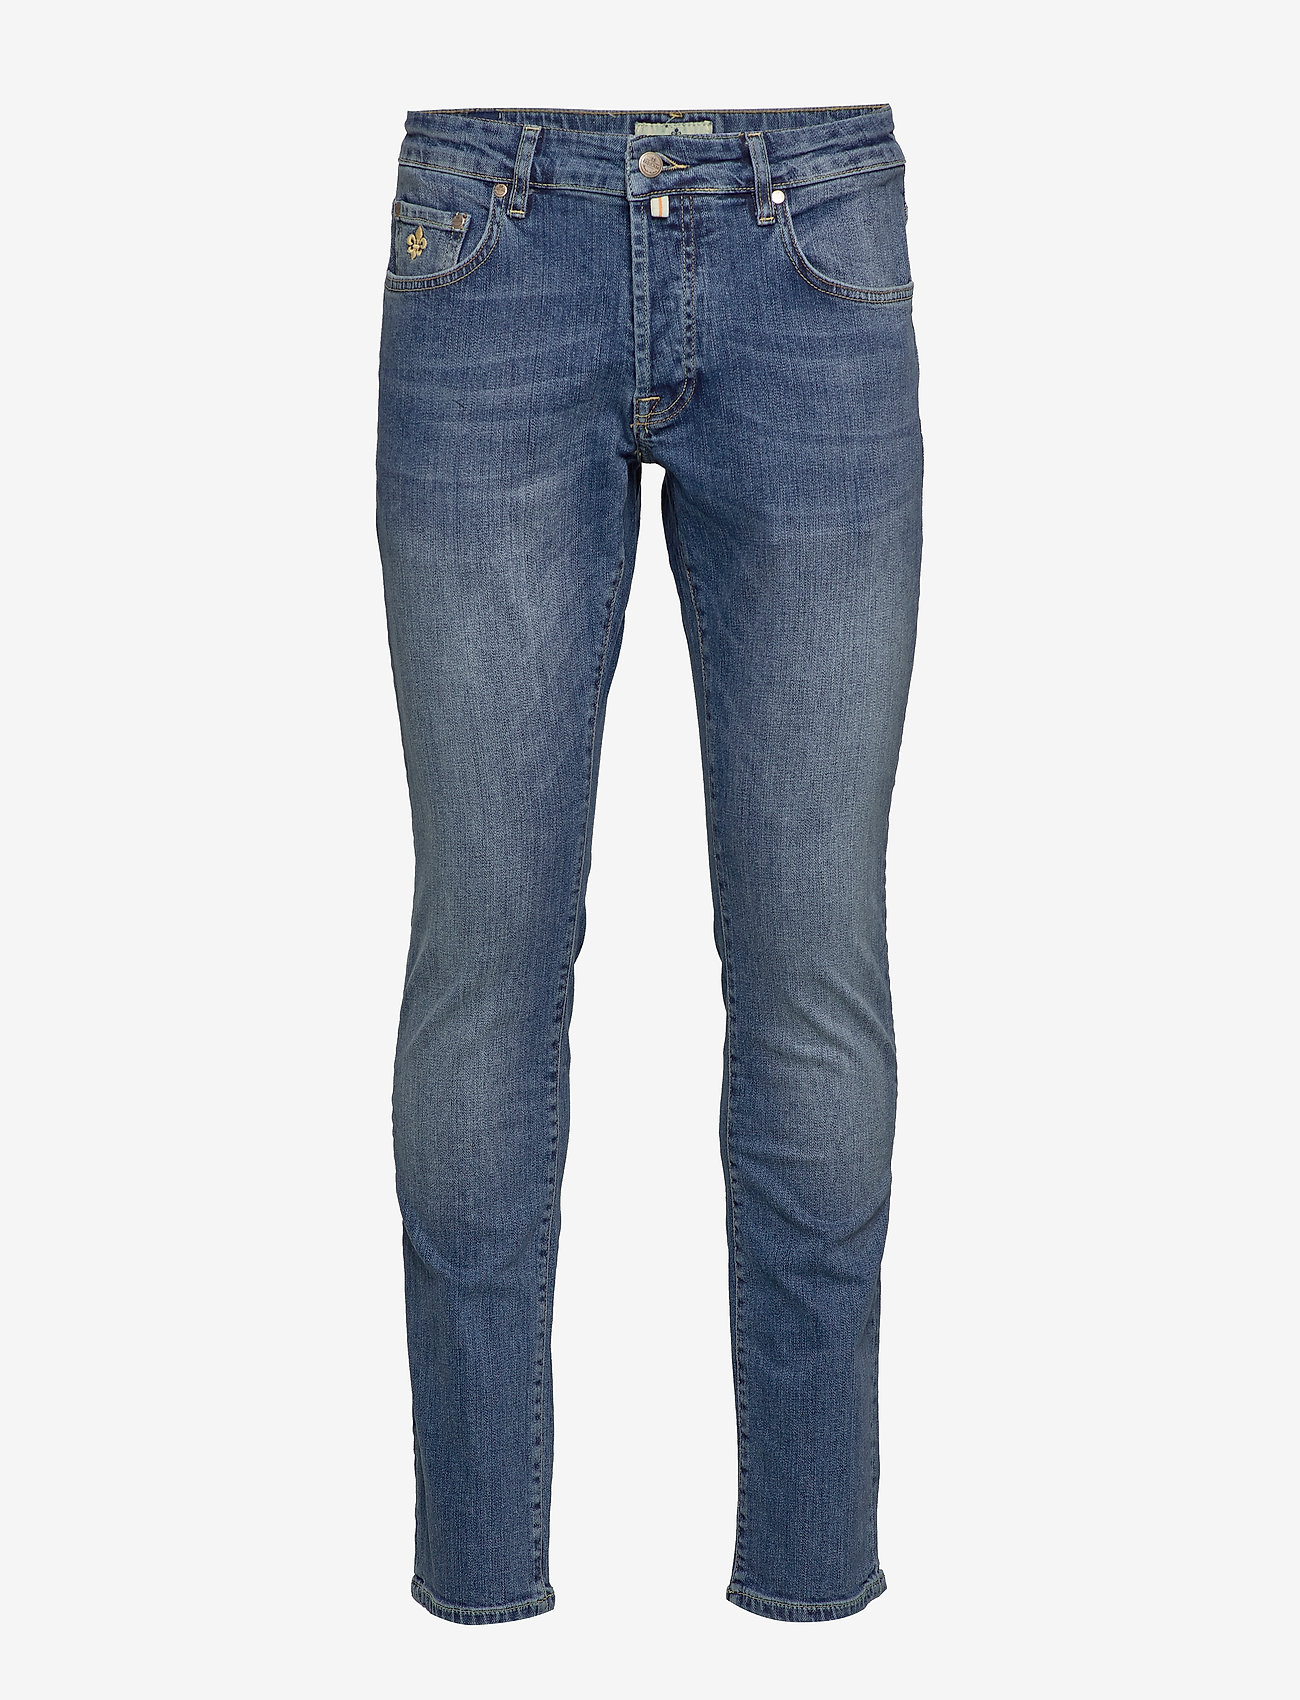 Morris - Steve Jeans - slim jeans - semi dark wash - 0